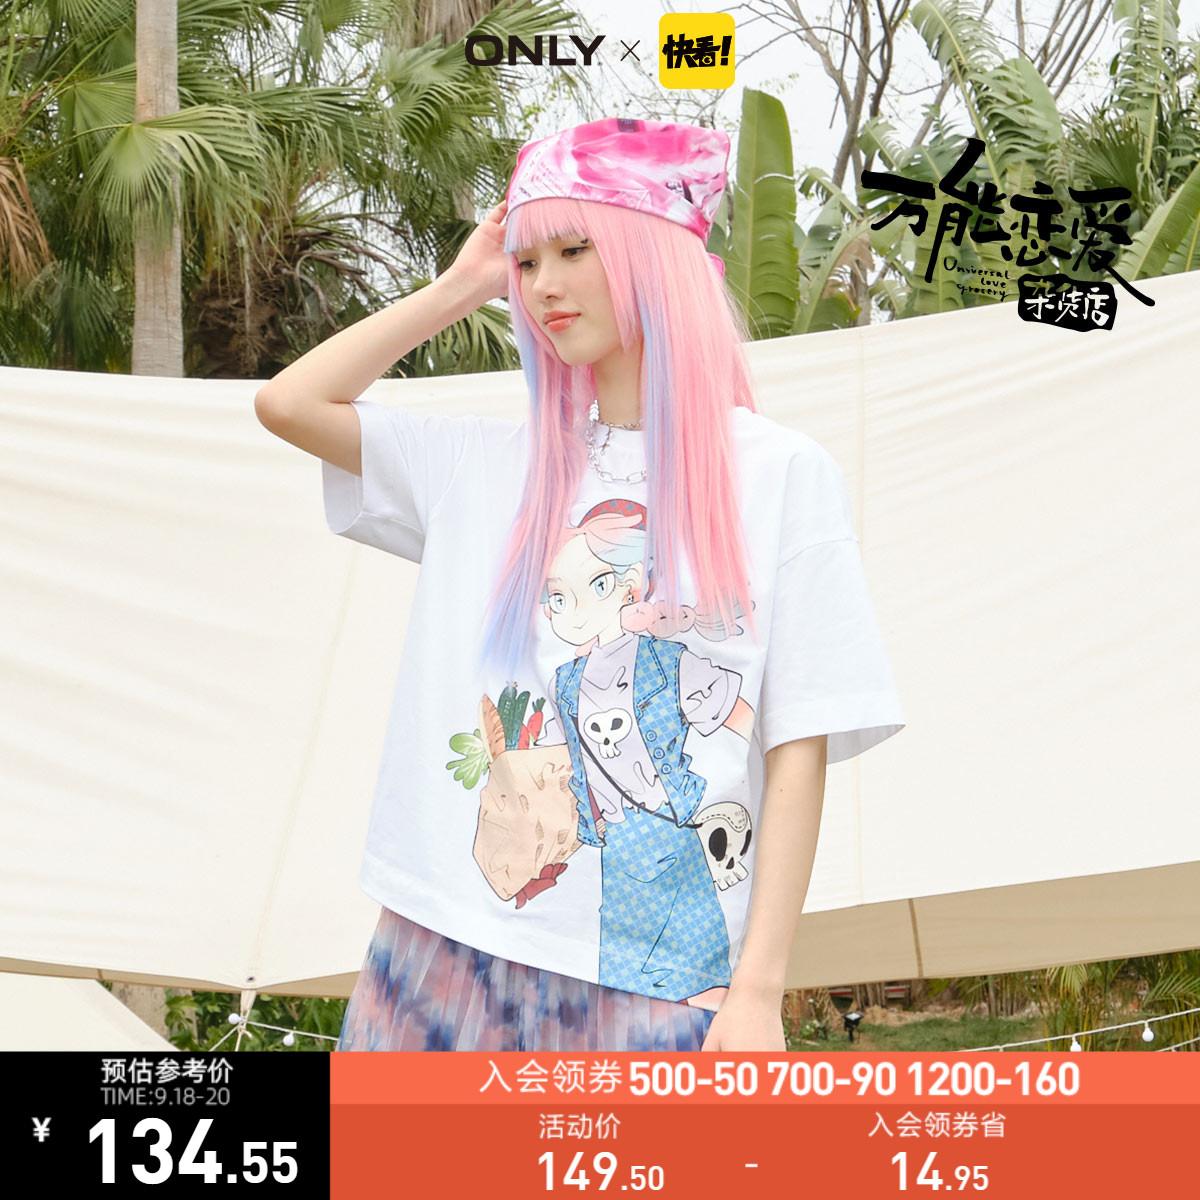 ONLY2021秋季新款恋爱杂货店联名宽松圆领印花T恤女|121201257